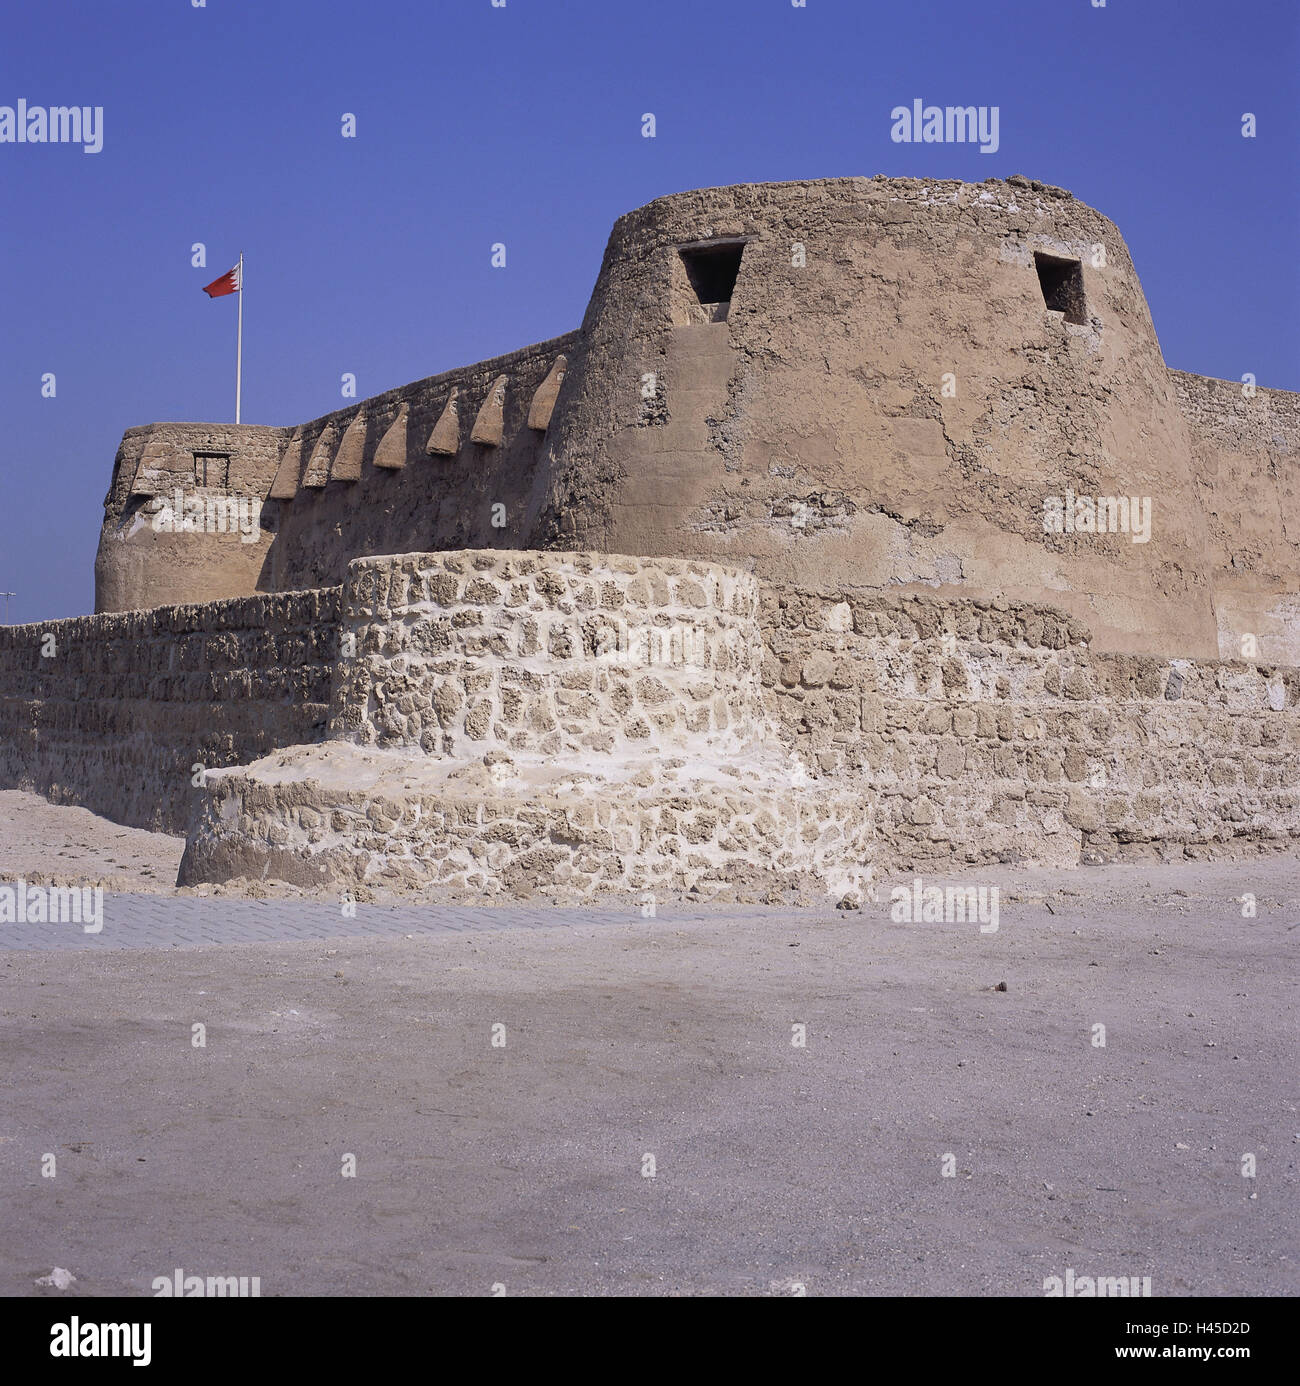 Bahrain, island Muharraq, fortress, Qala'at Arad, island state, sheikdom, destination, building, architecture, - Stock Image